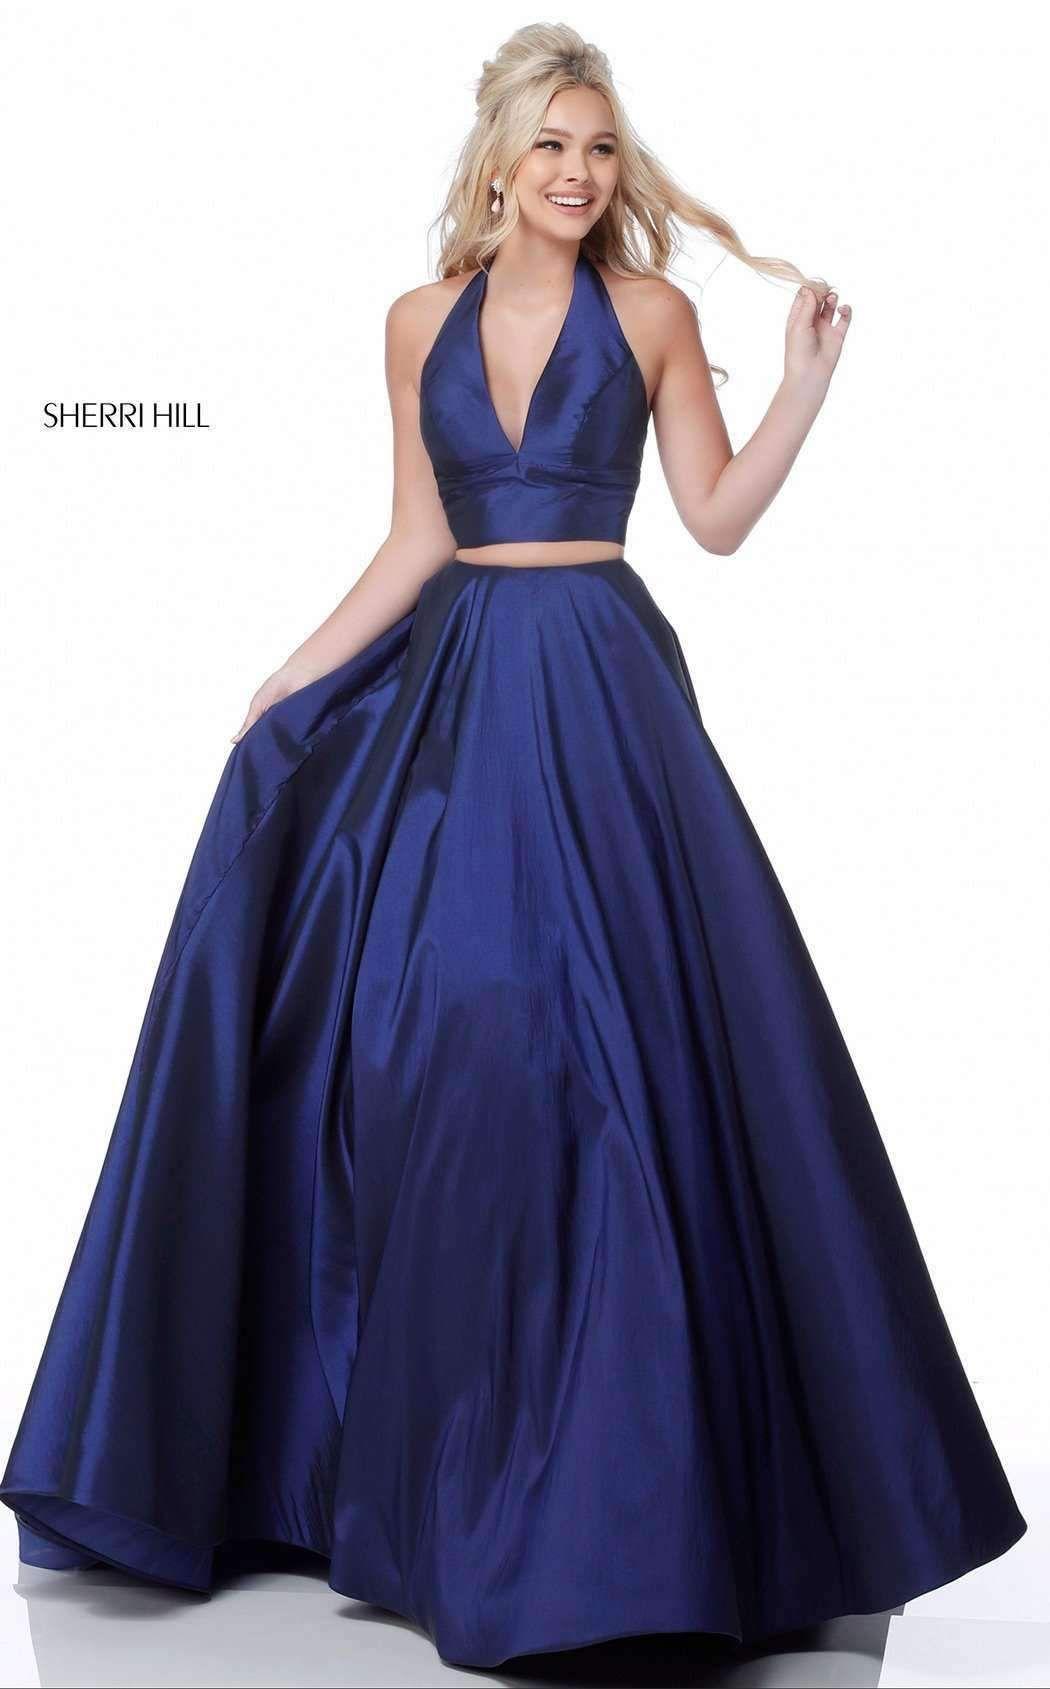 Sherri Hill 12 Dress in 12  Abendkleid, Kleider